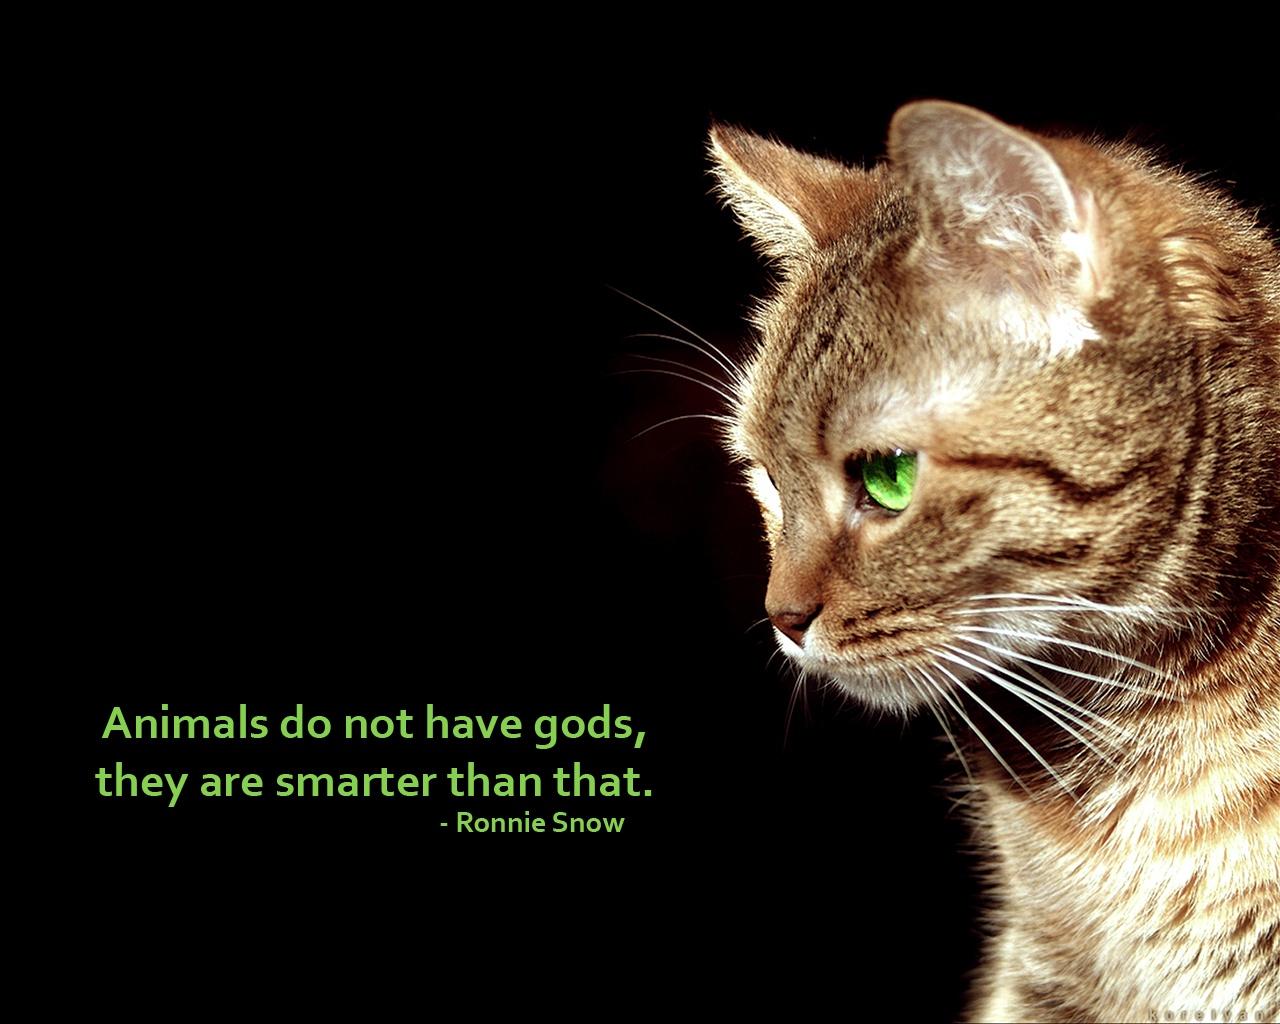 Animals Quotes Black_Cats_Animals_Quotes1N7B